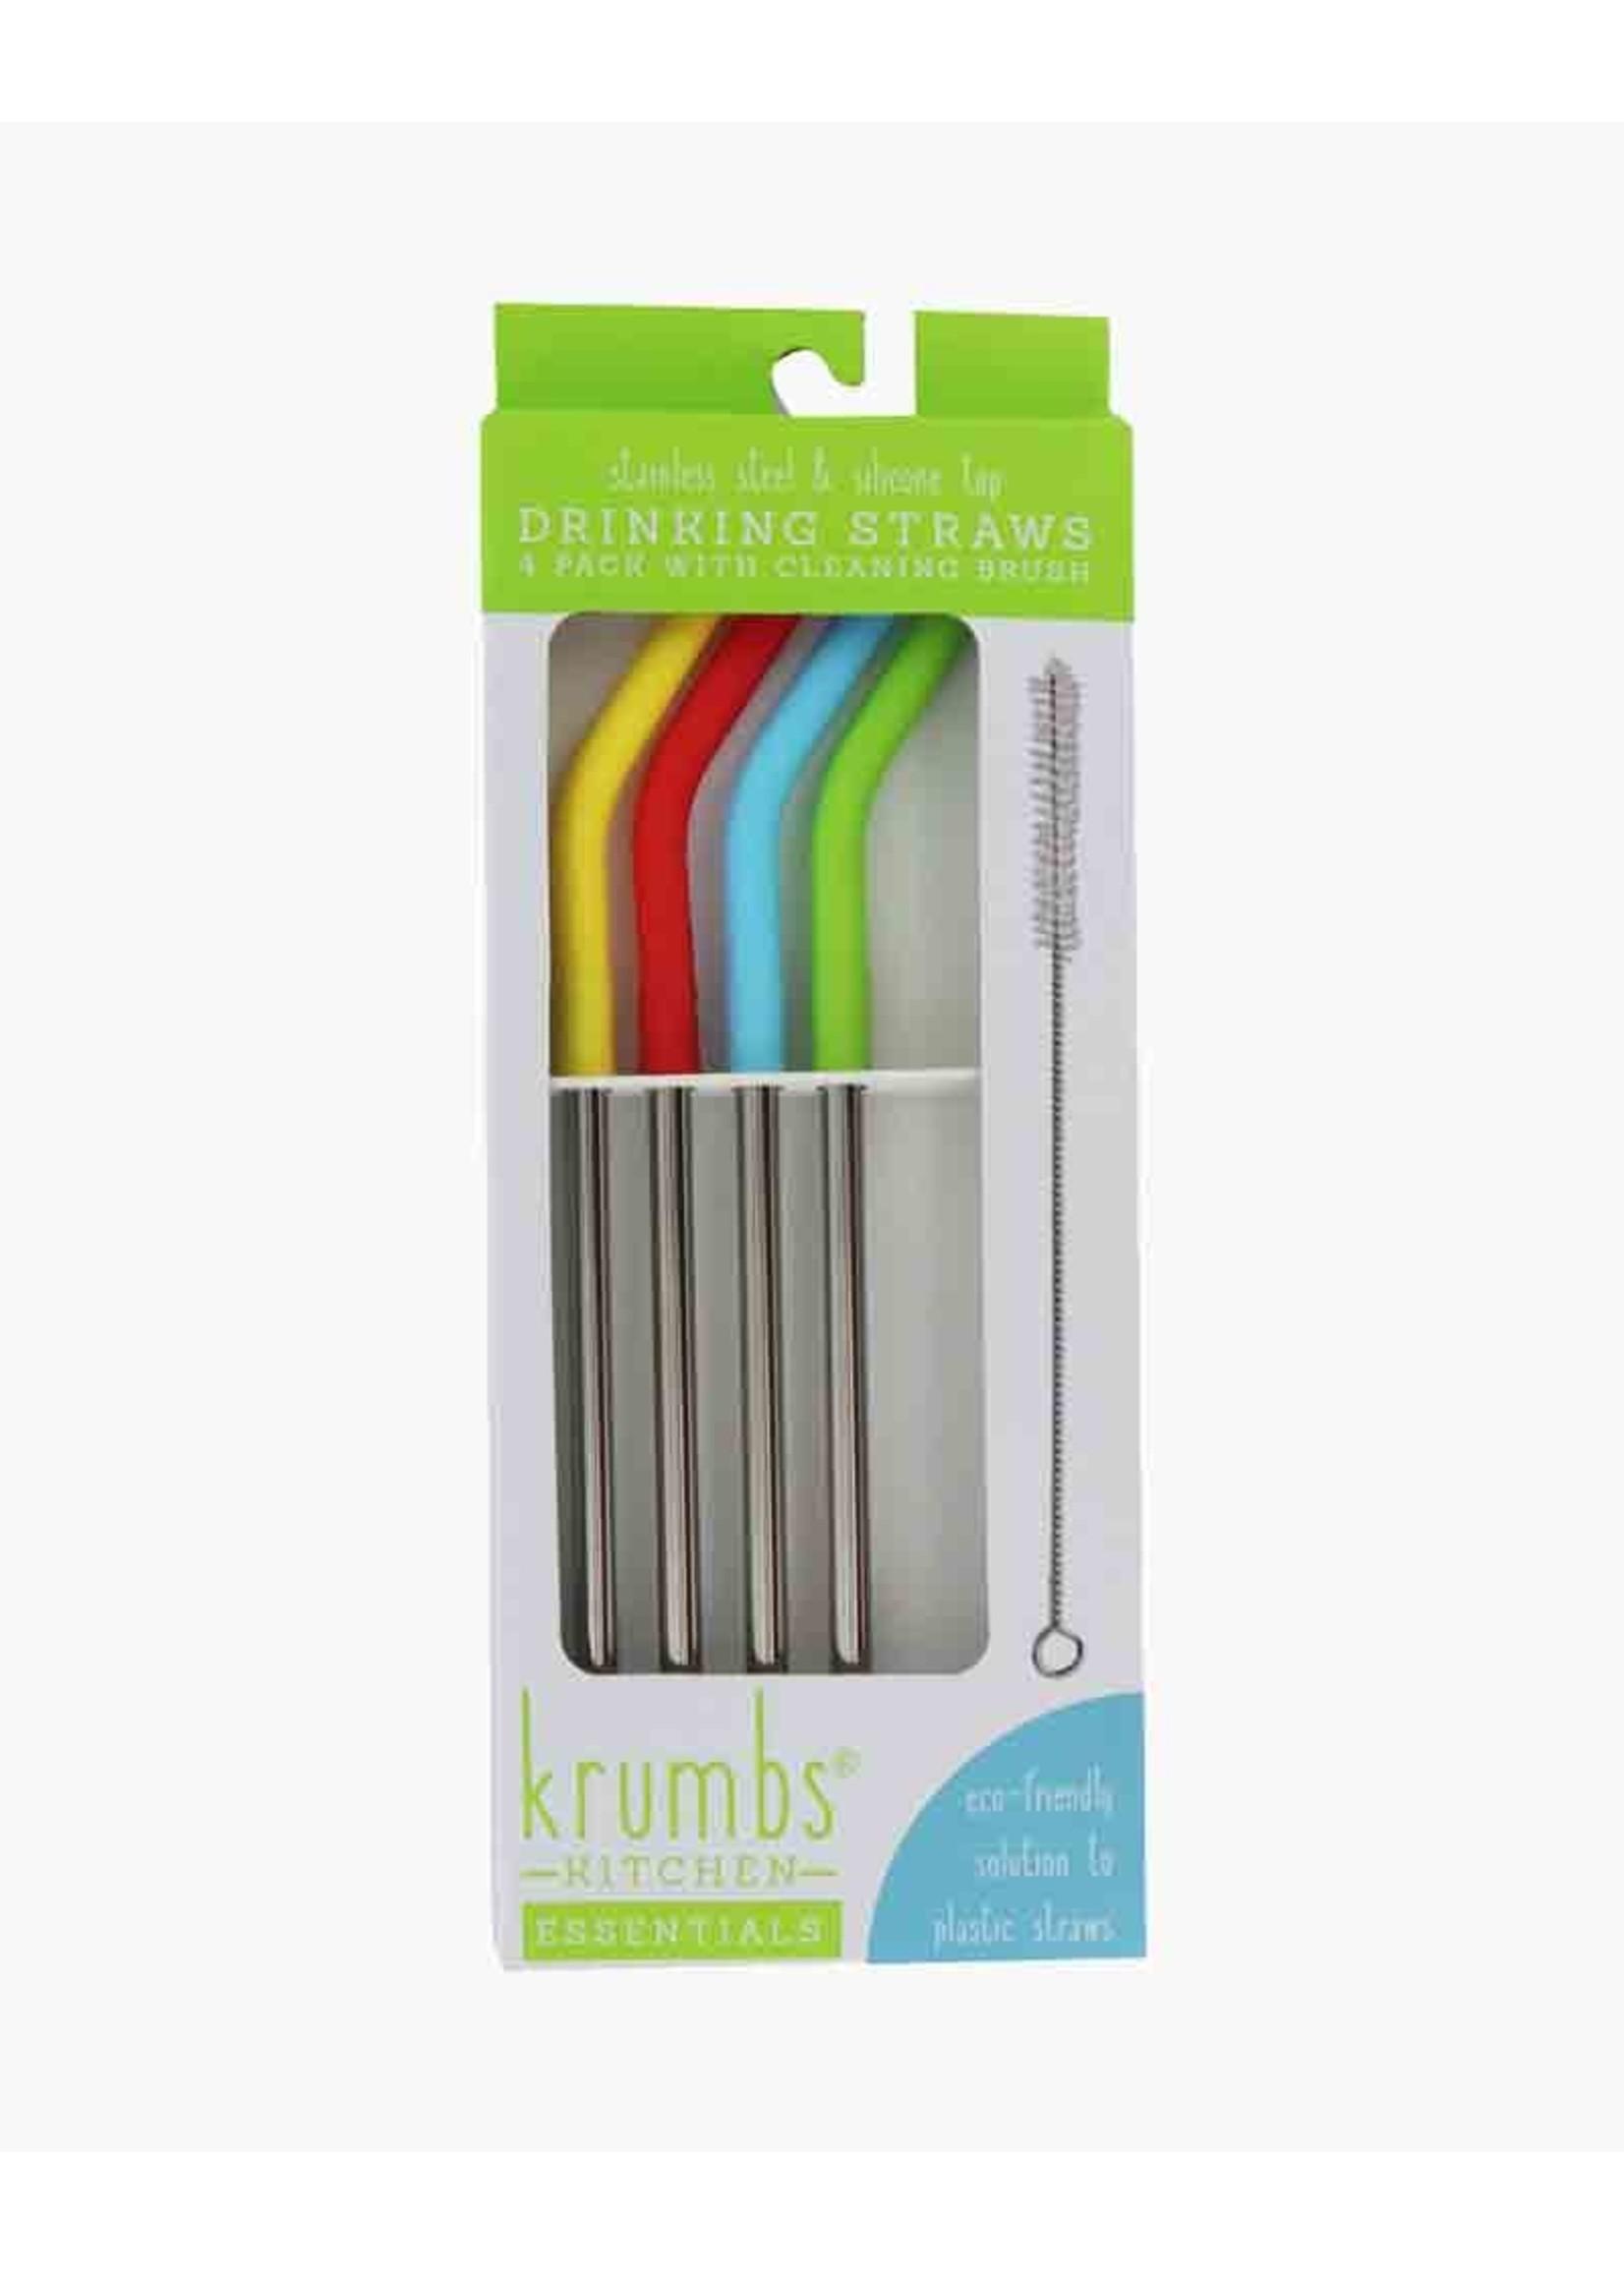 Krumbs Kitchen 4 Piece Stainless Steel Straw with Brush Cleaner